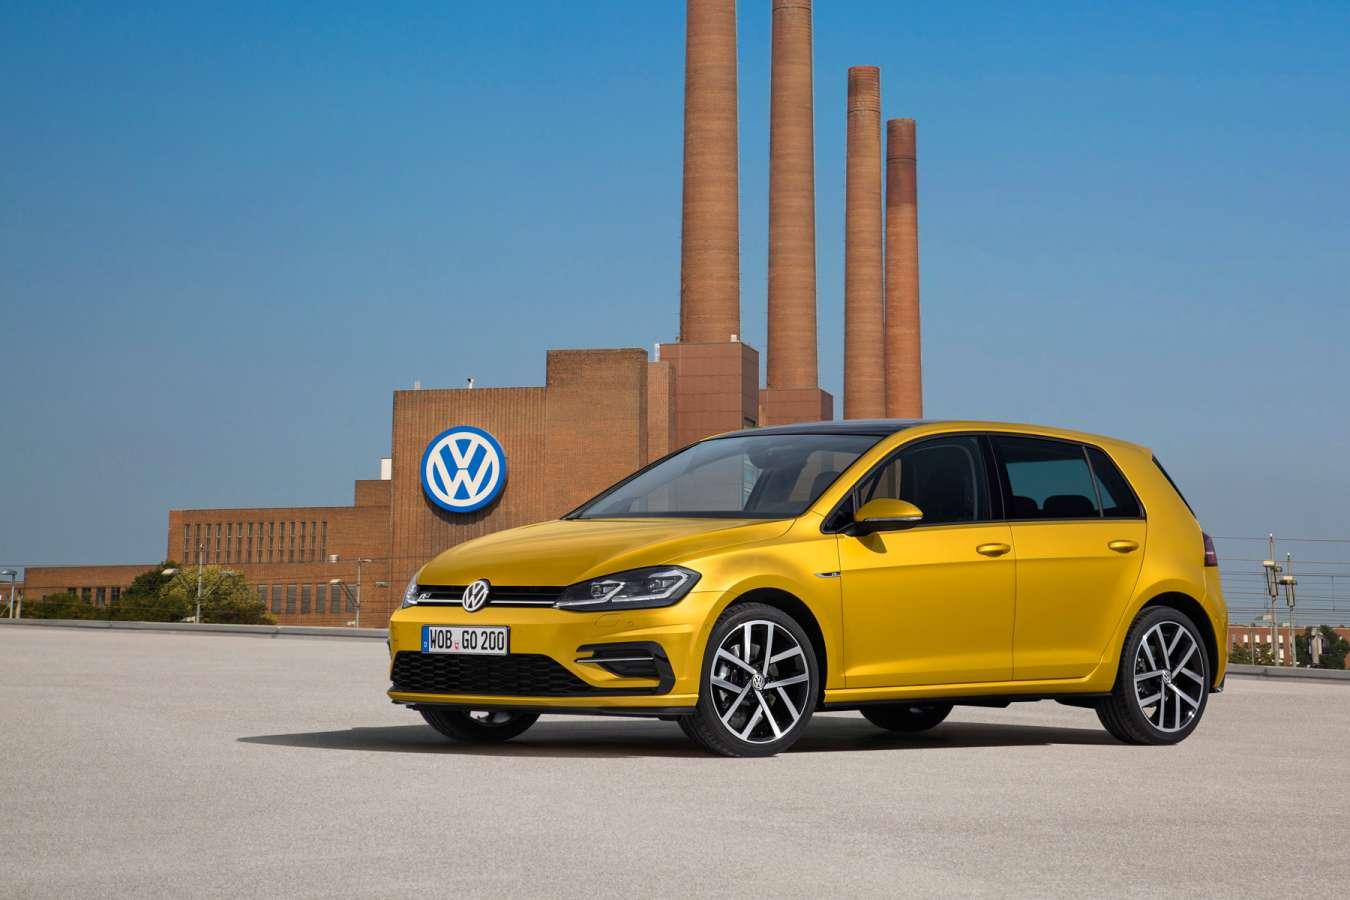 Volkswagen signent un accord sur un site de production en Turquie